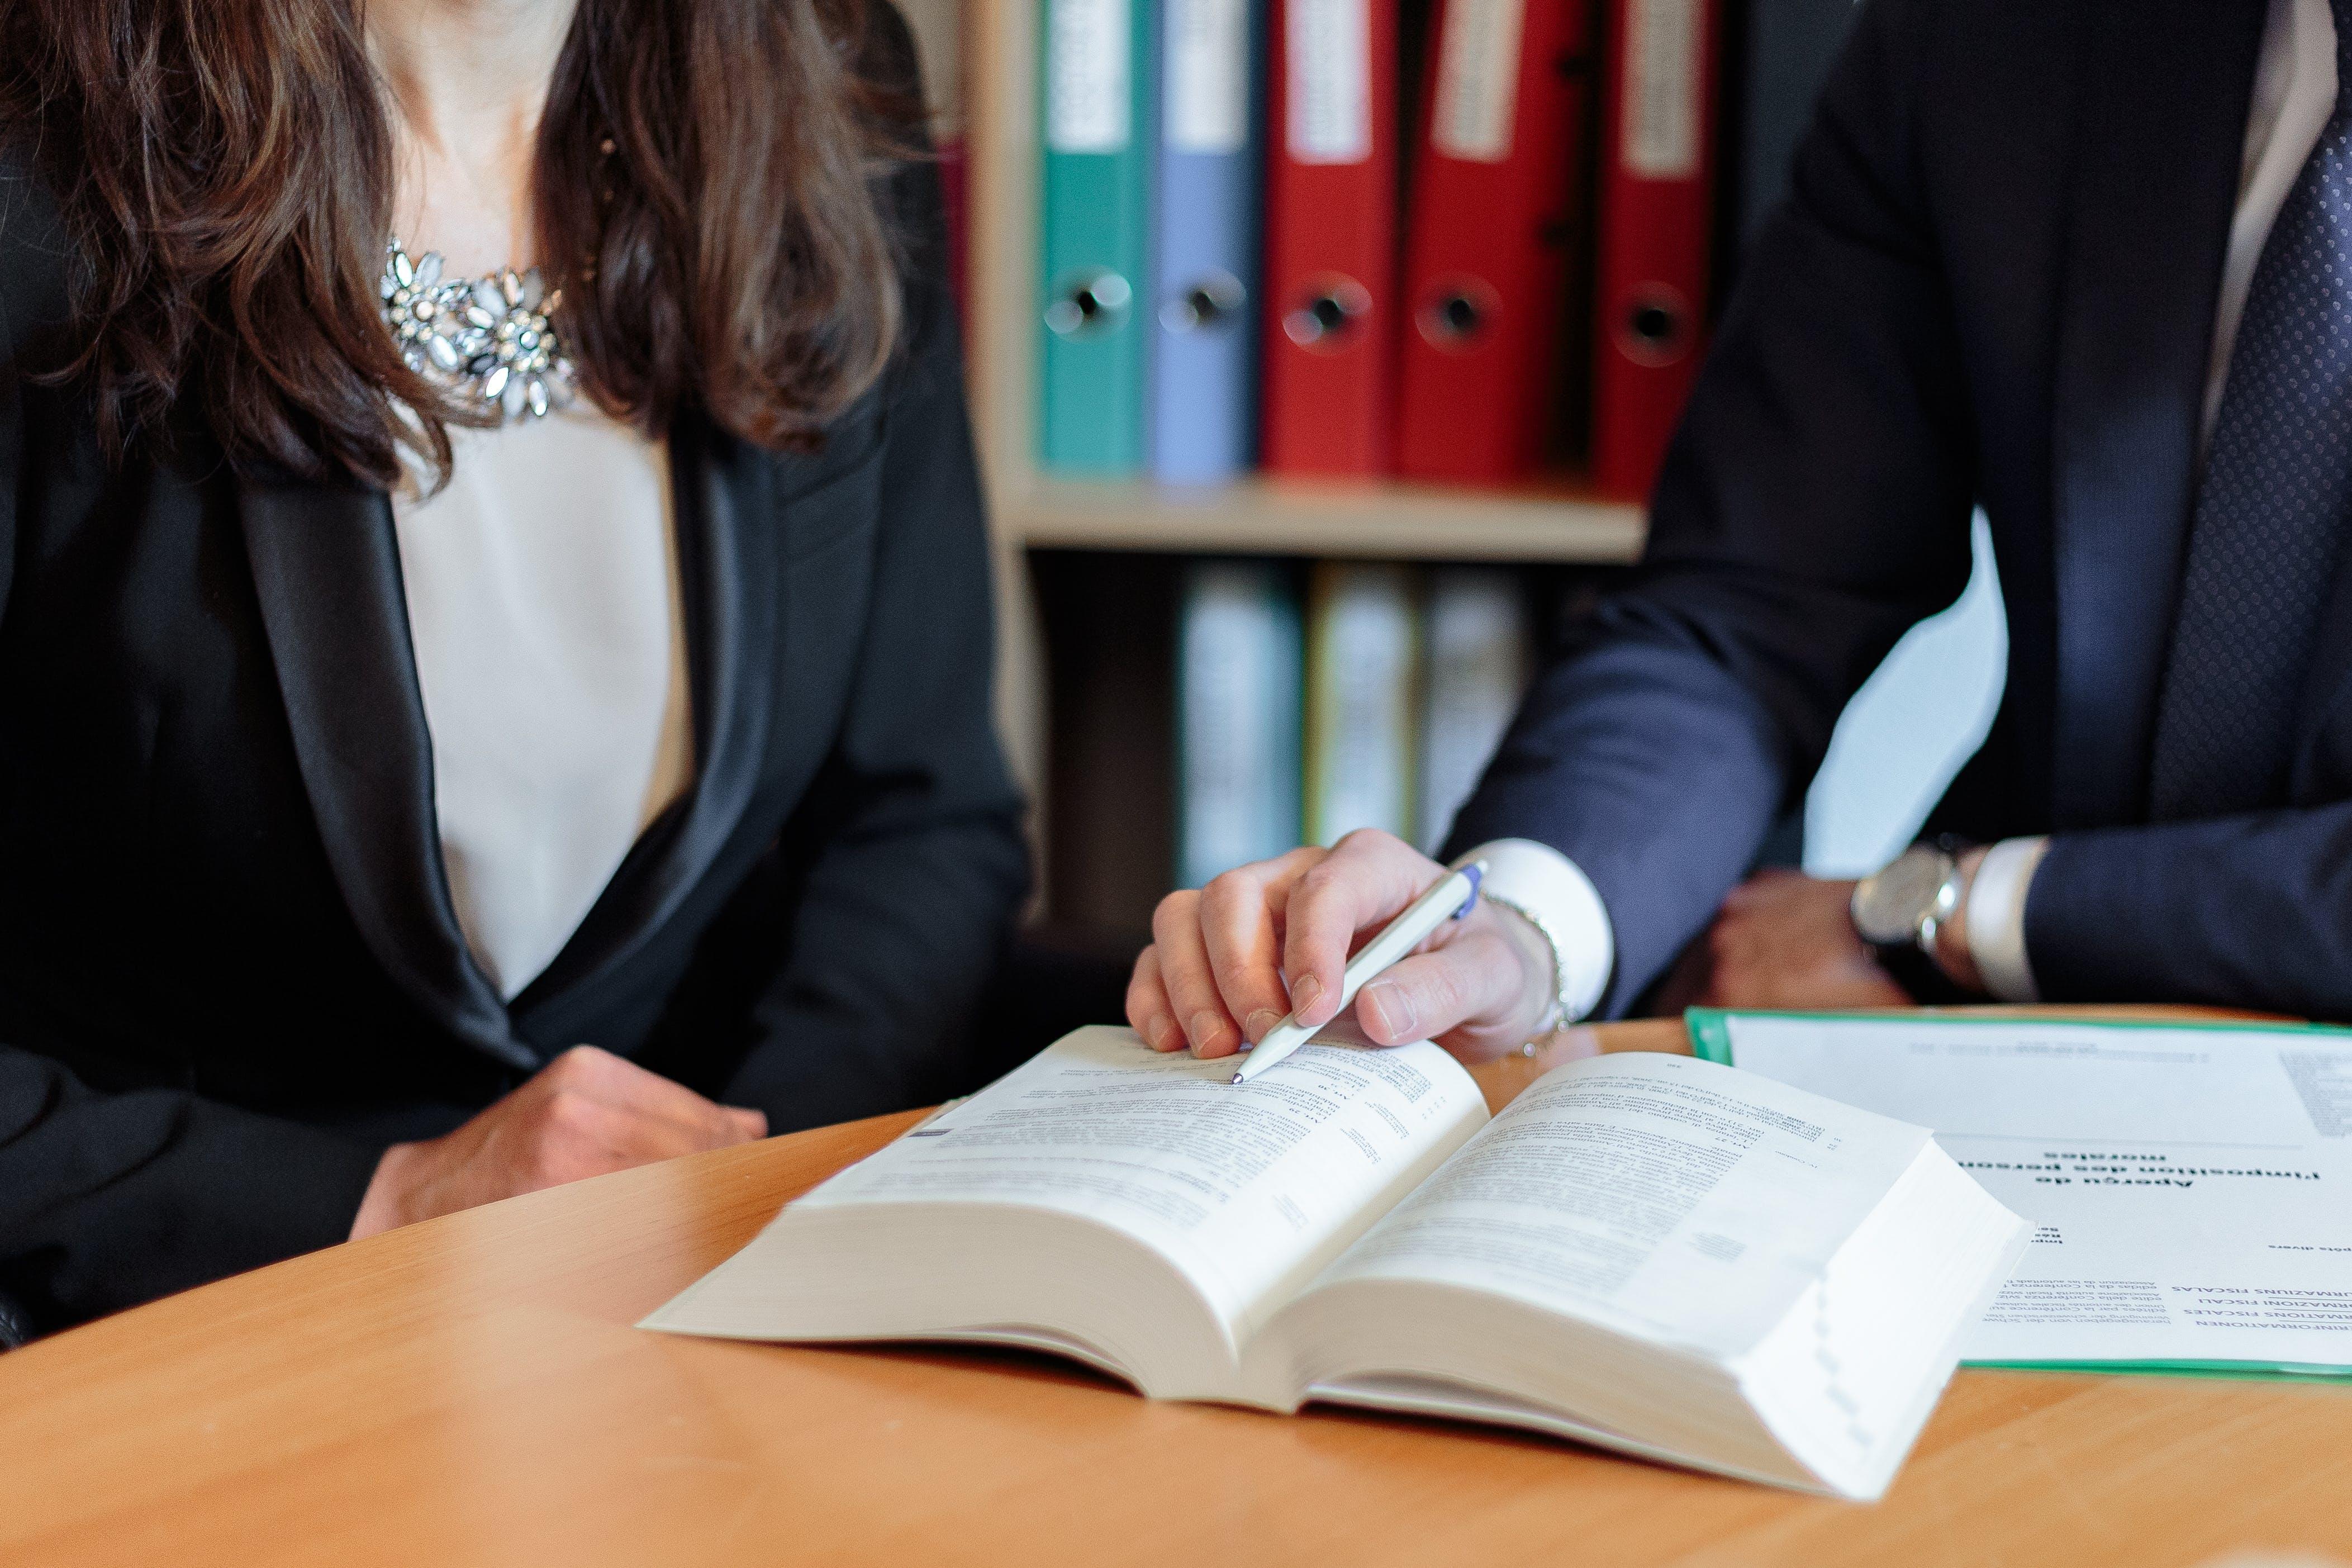 Man and Woman Sitting Facing Book